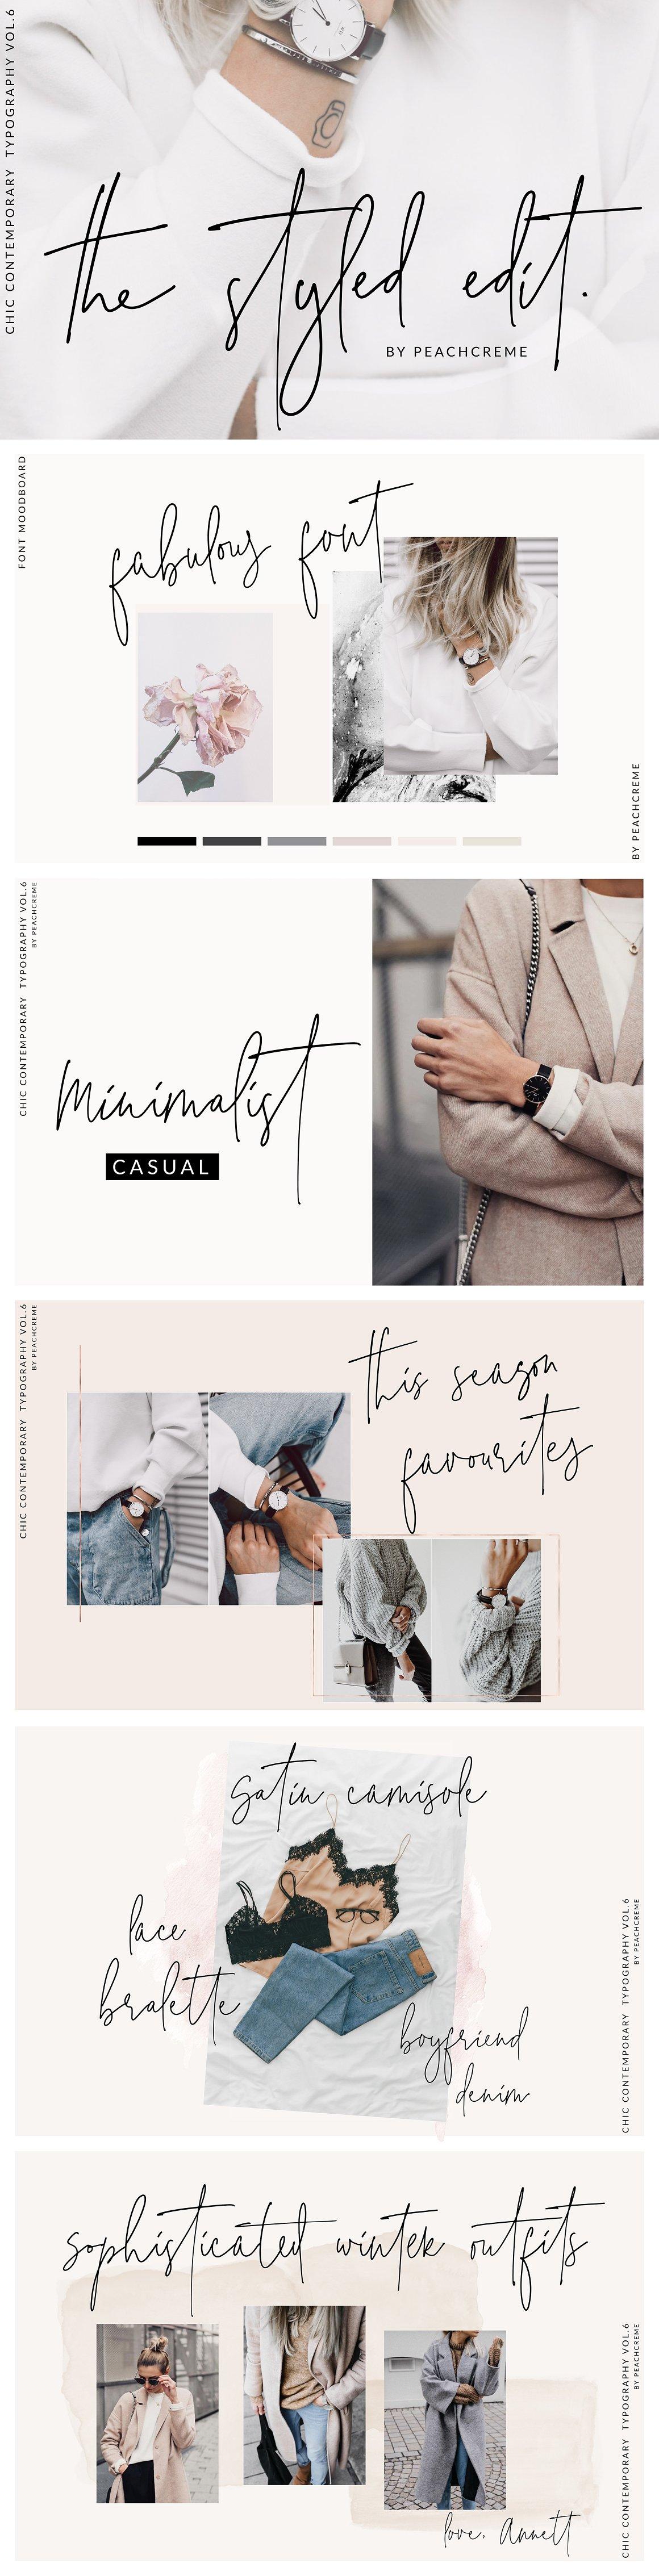 Th Styled Edit-Chic Ligature Font